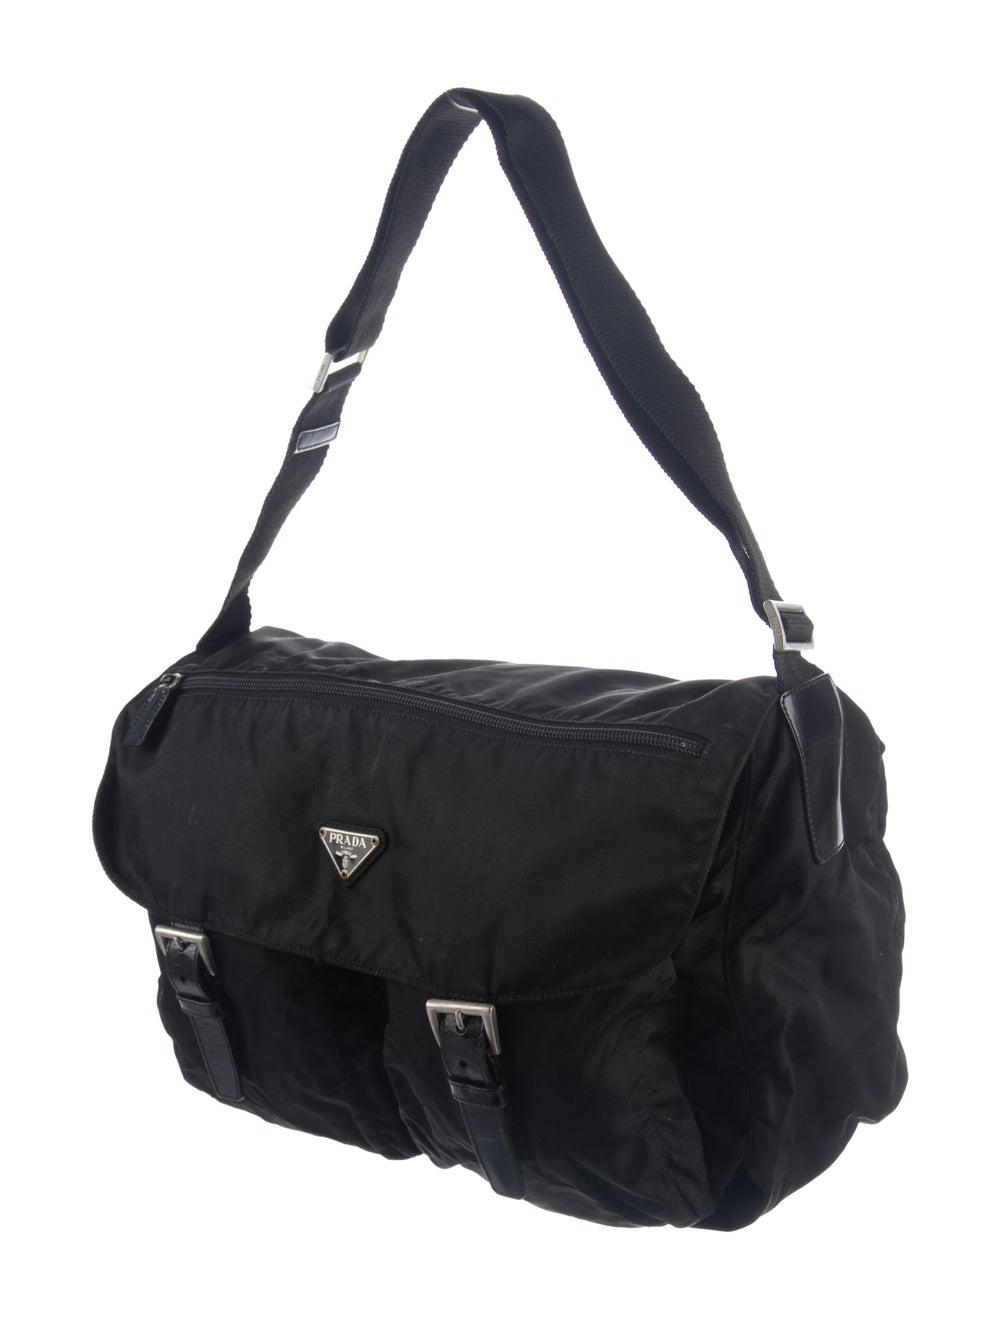 Prada Vela Messenger Bag Black - image 3